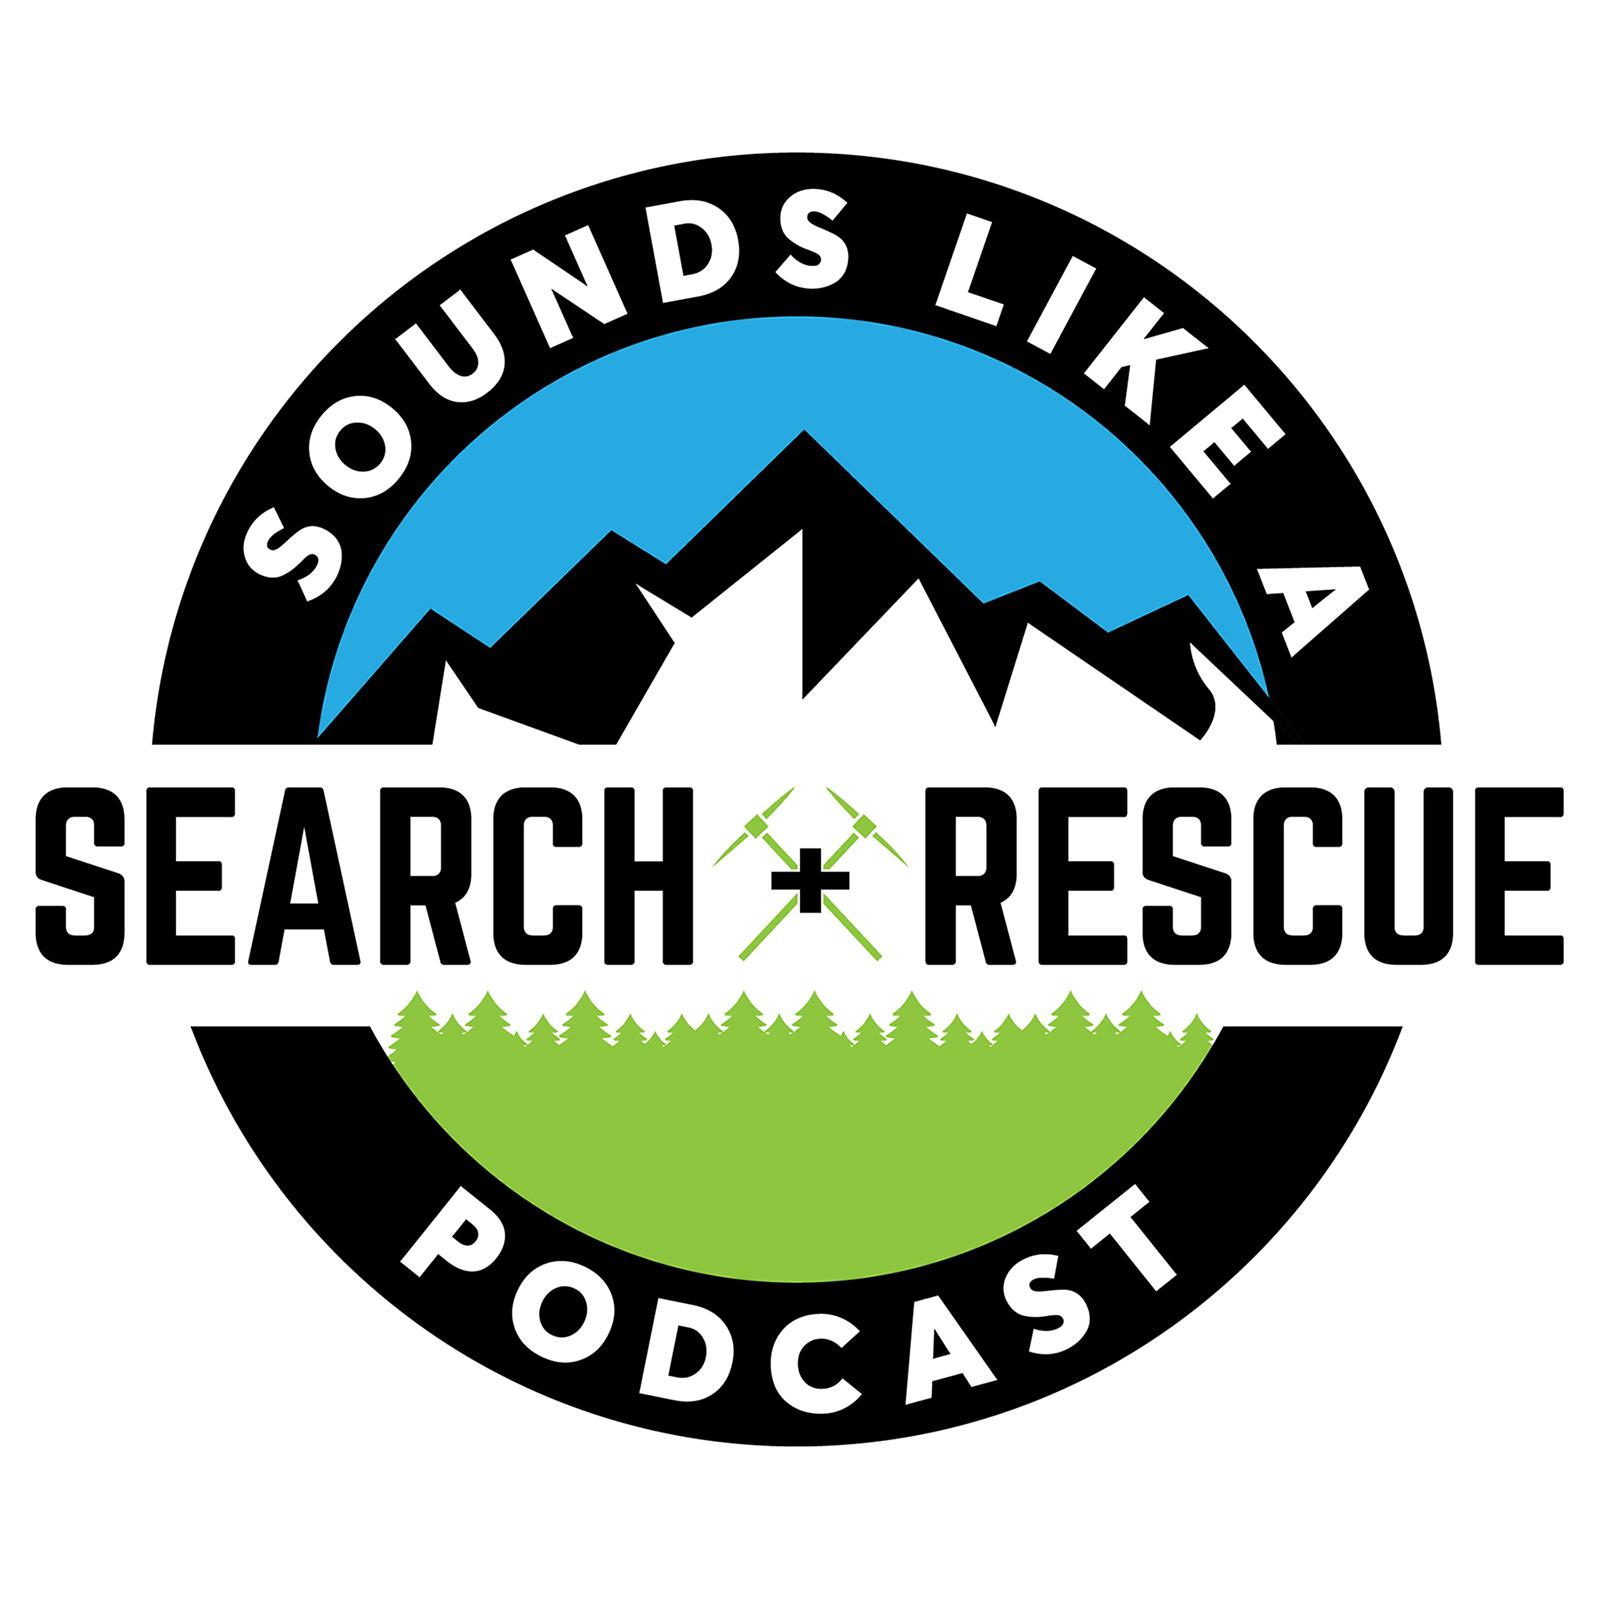 Episode 17 - Knobbie Hikes - Monadnock Sunapee Greenway & Cohos Trail